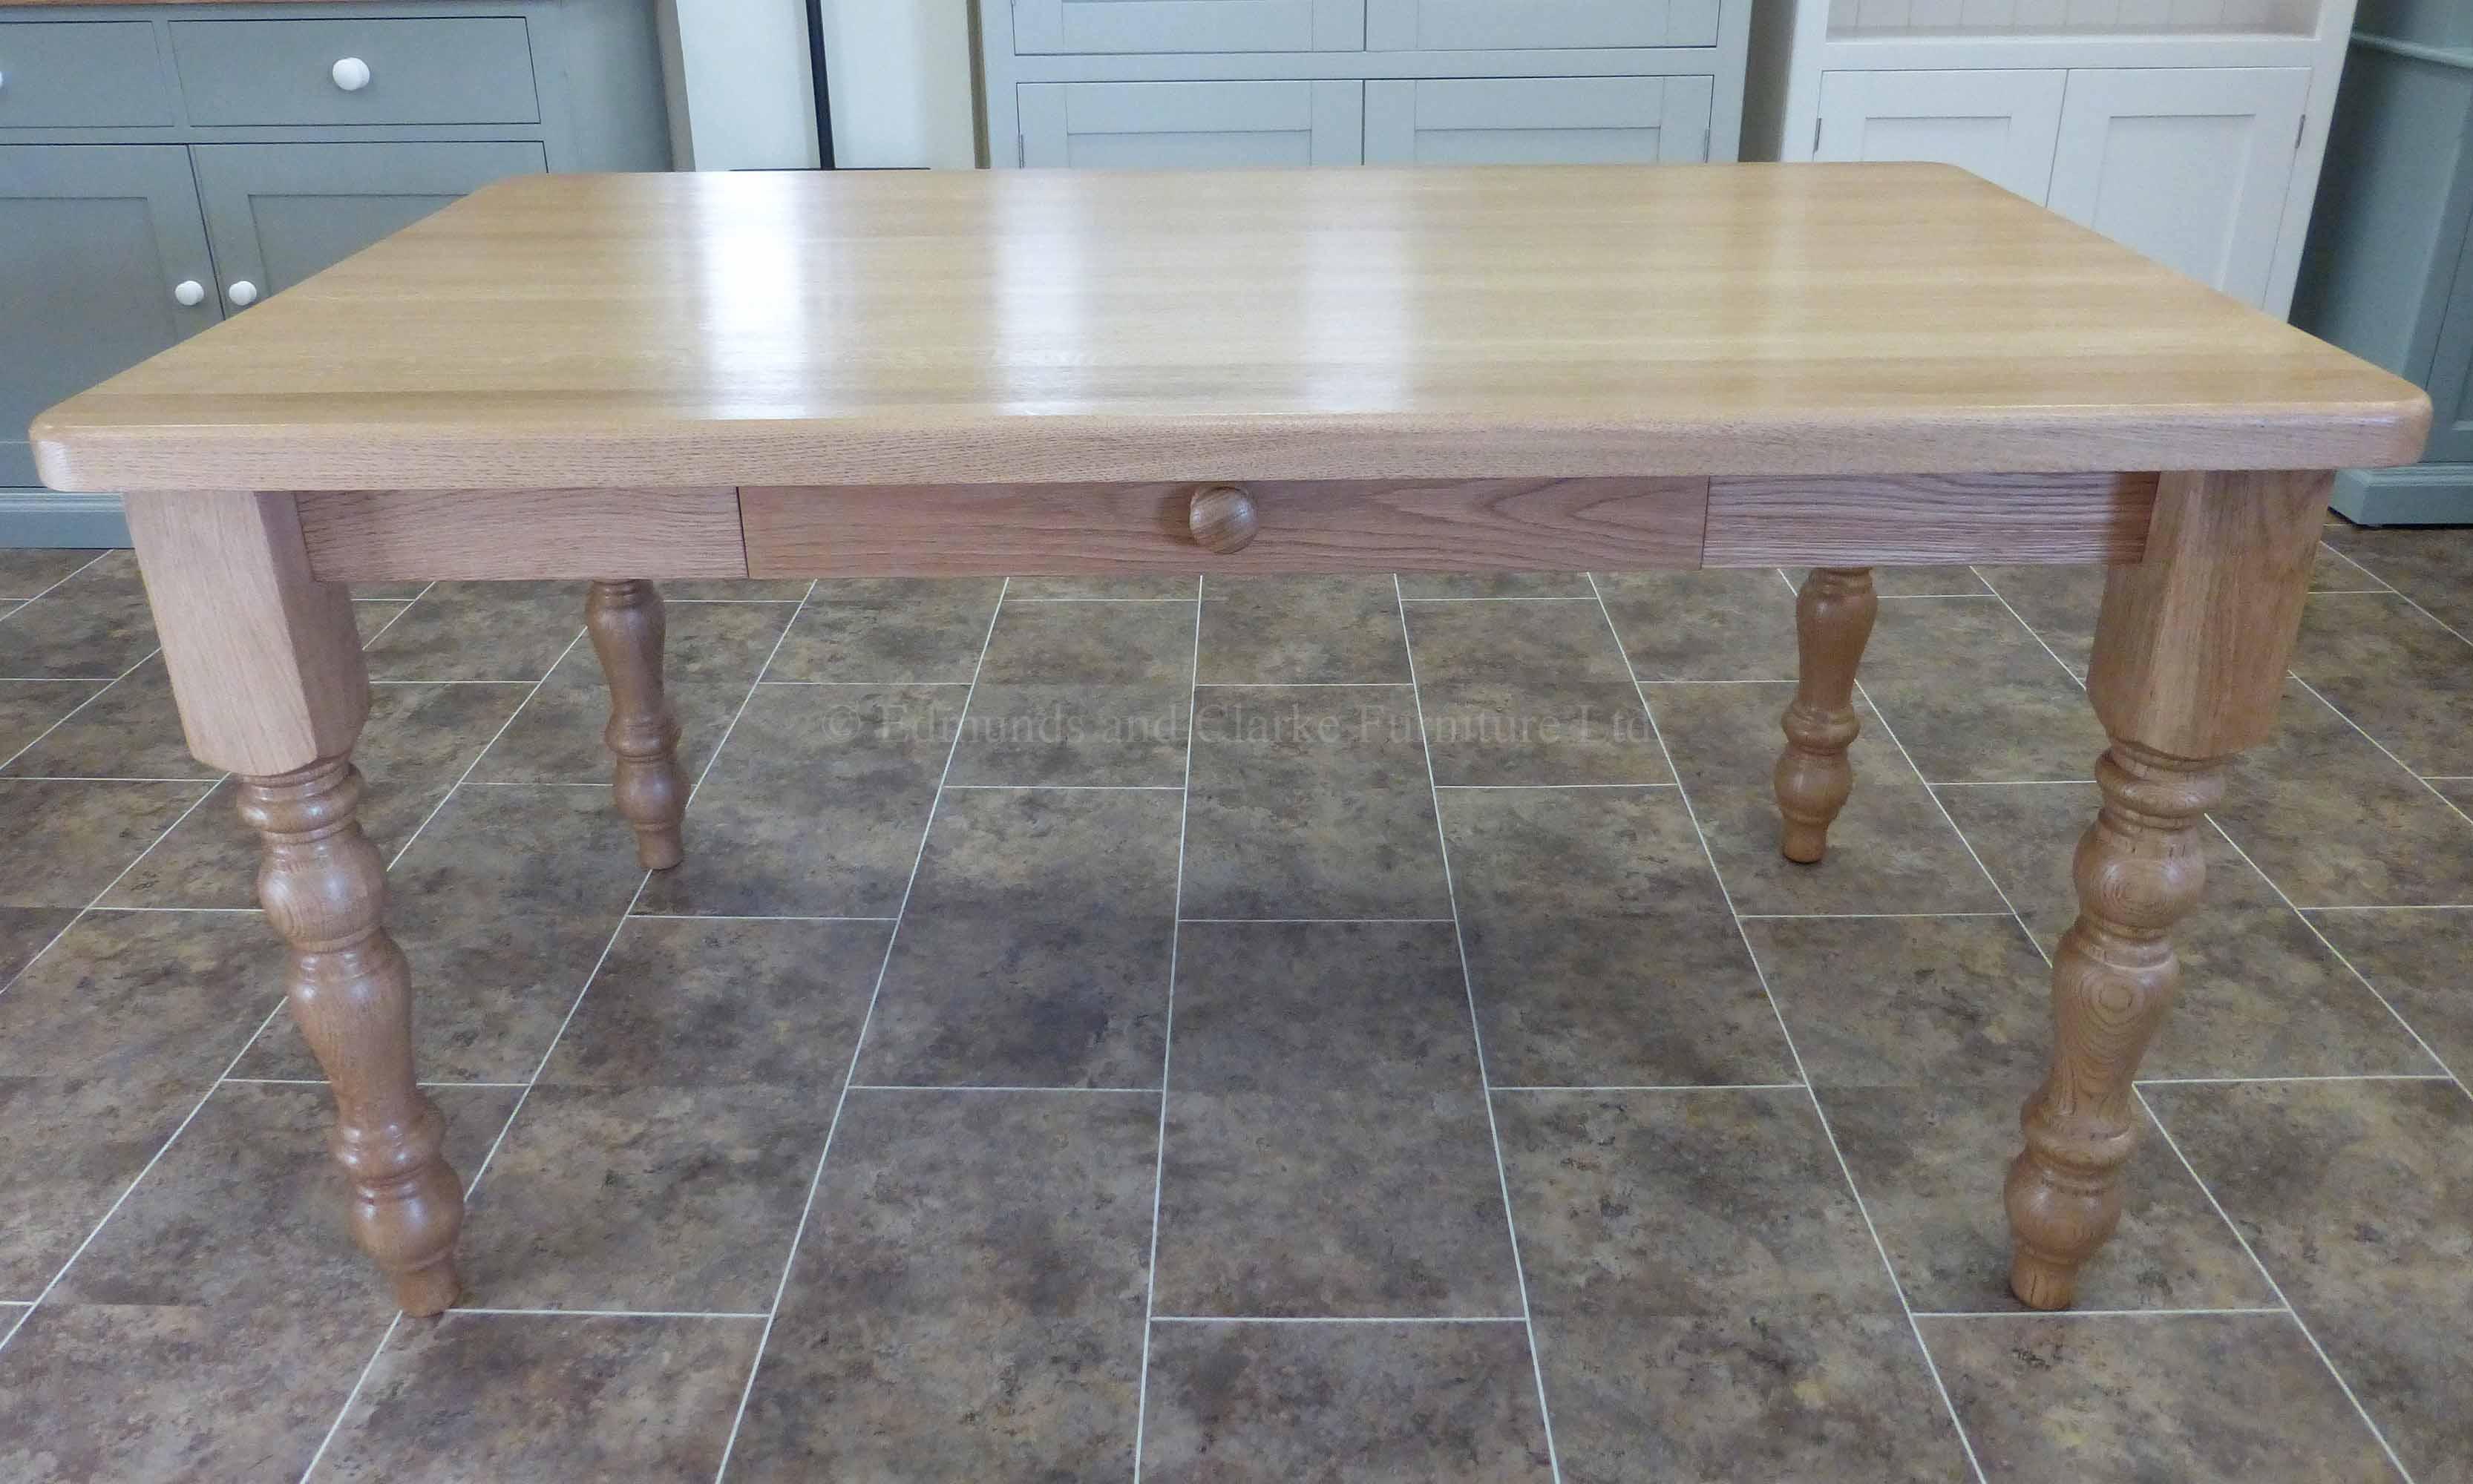 Farmhouse 5' x 3' table solid oak turned legs